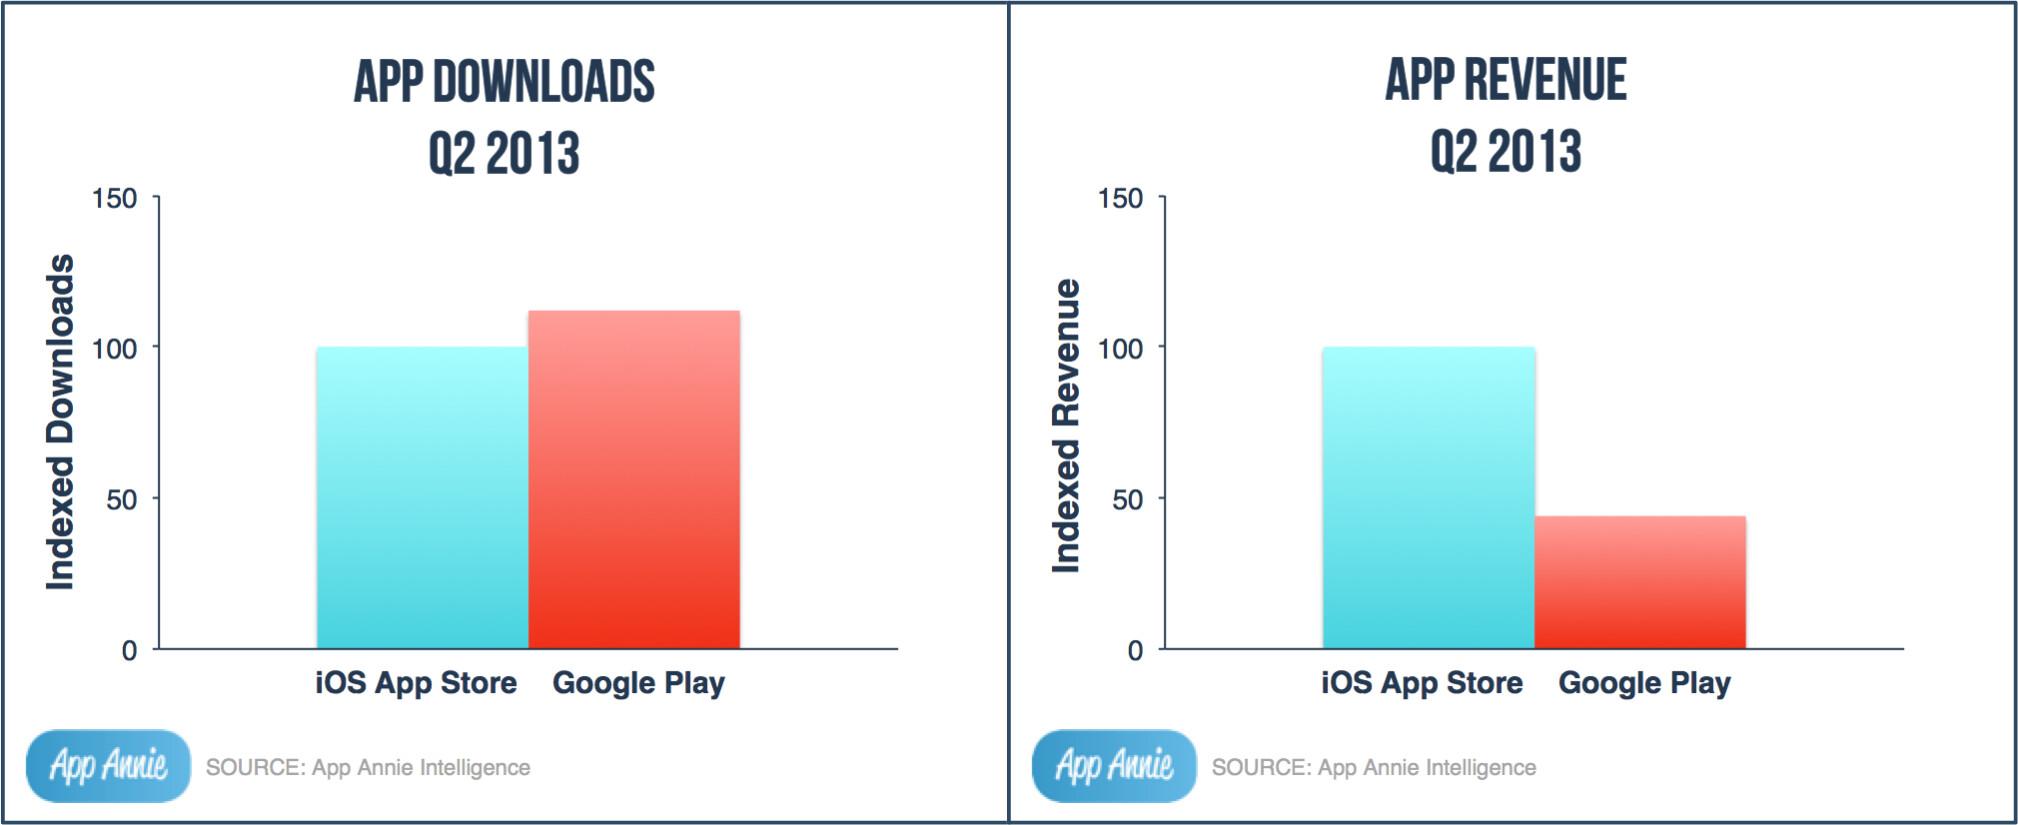 Google Play beats Apple in Q2 app downloads, but still gets